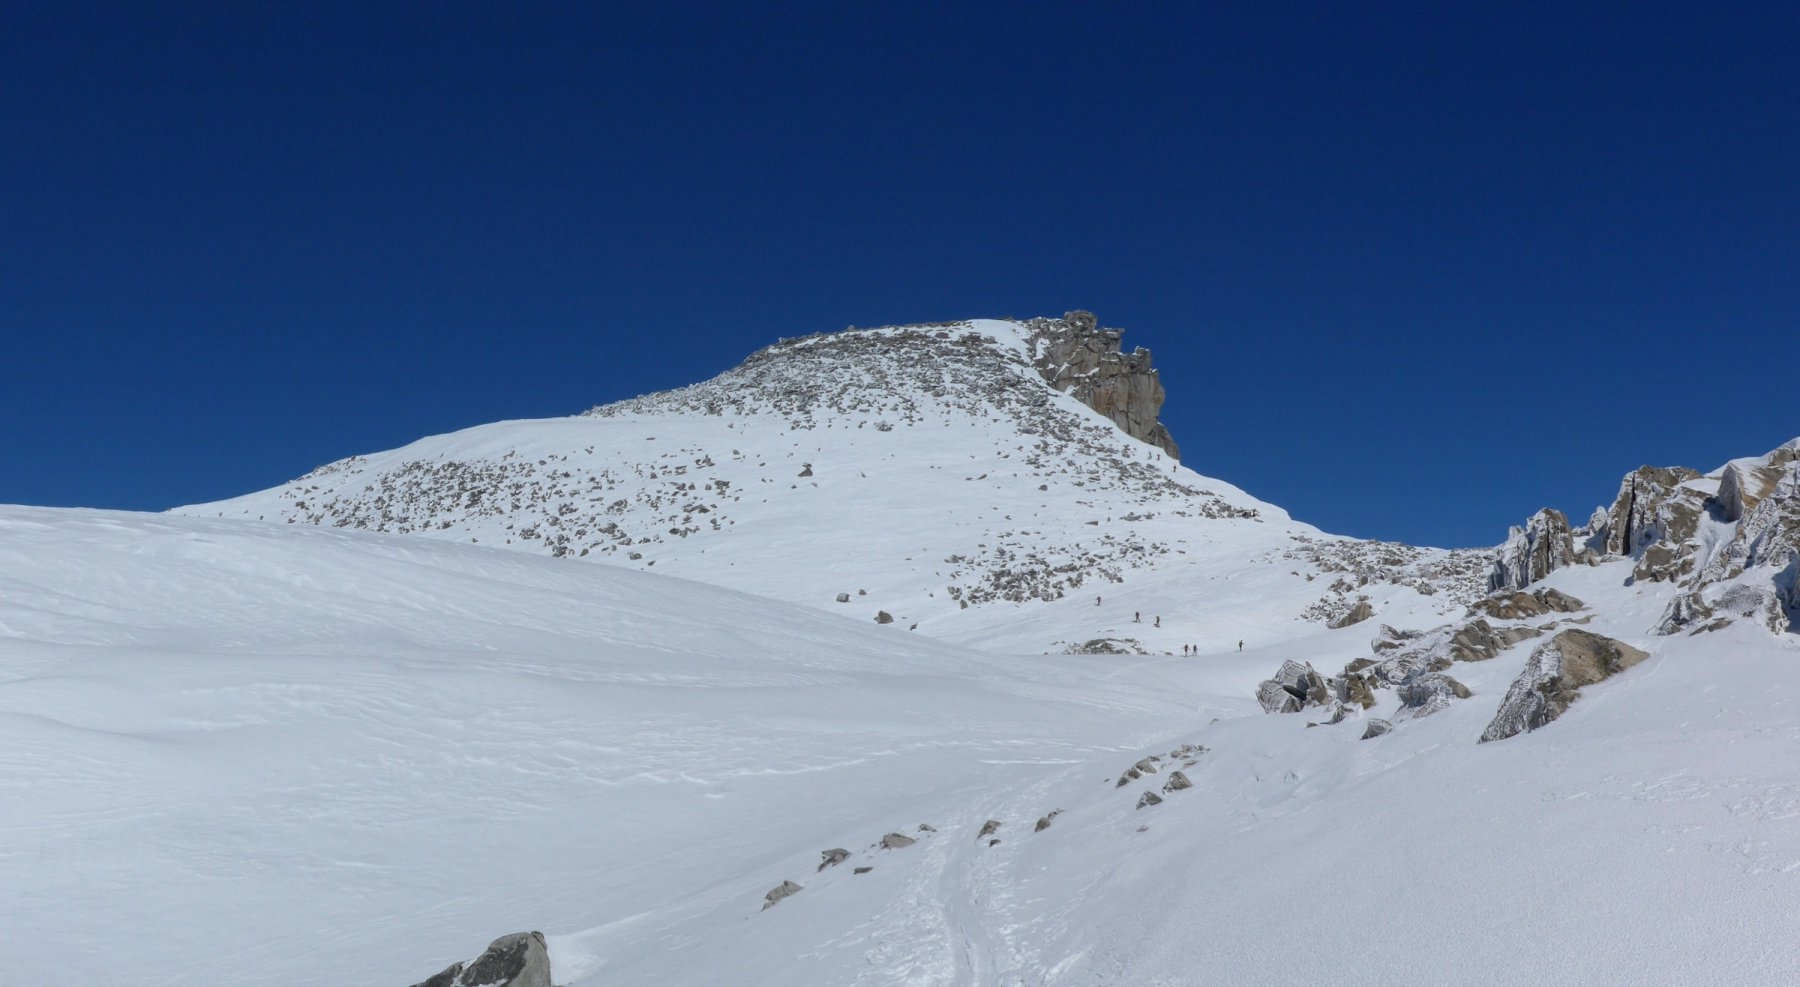 Mittelbergpass e Punta di Valdeserta (Grosses Schinhorn per gli svizzeri)